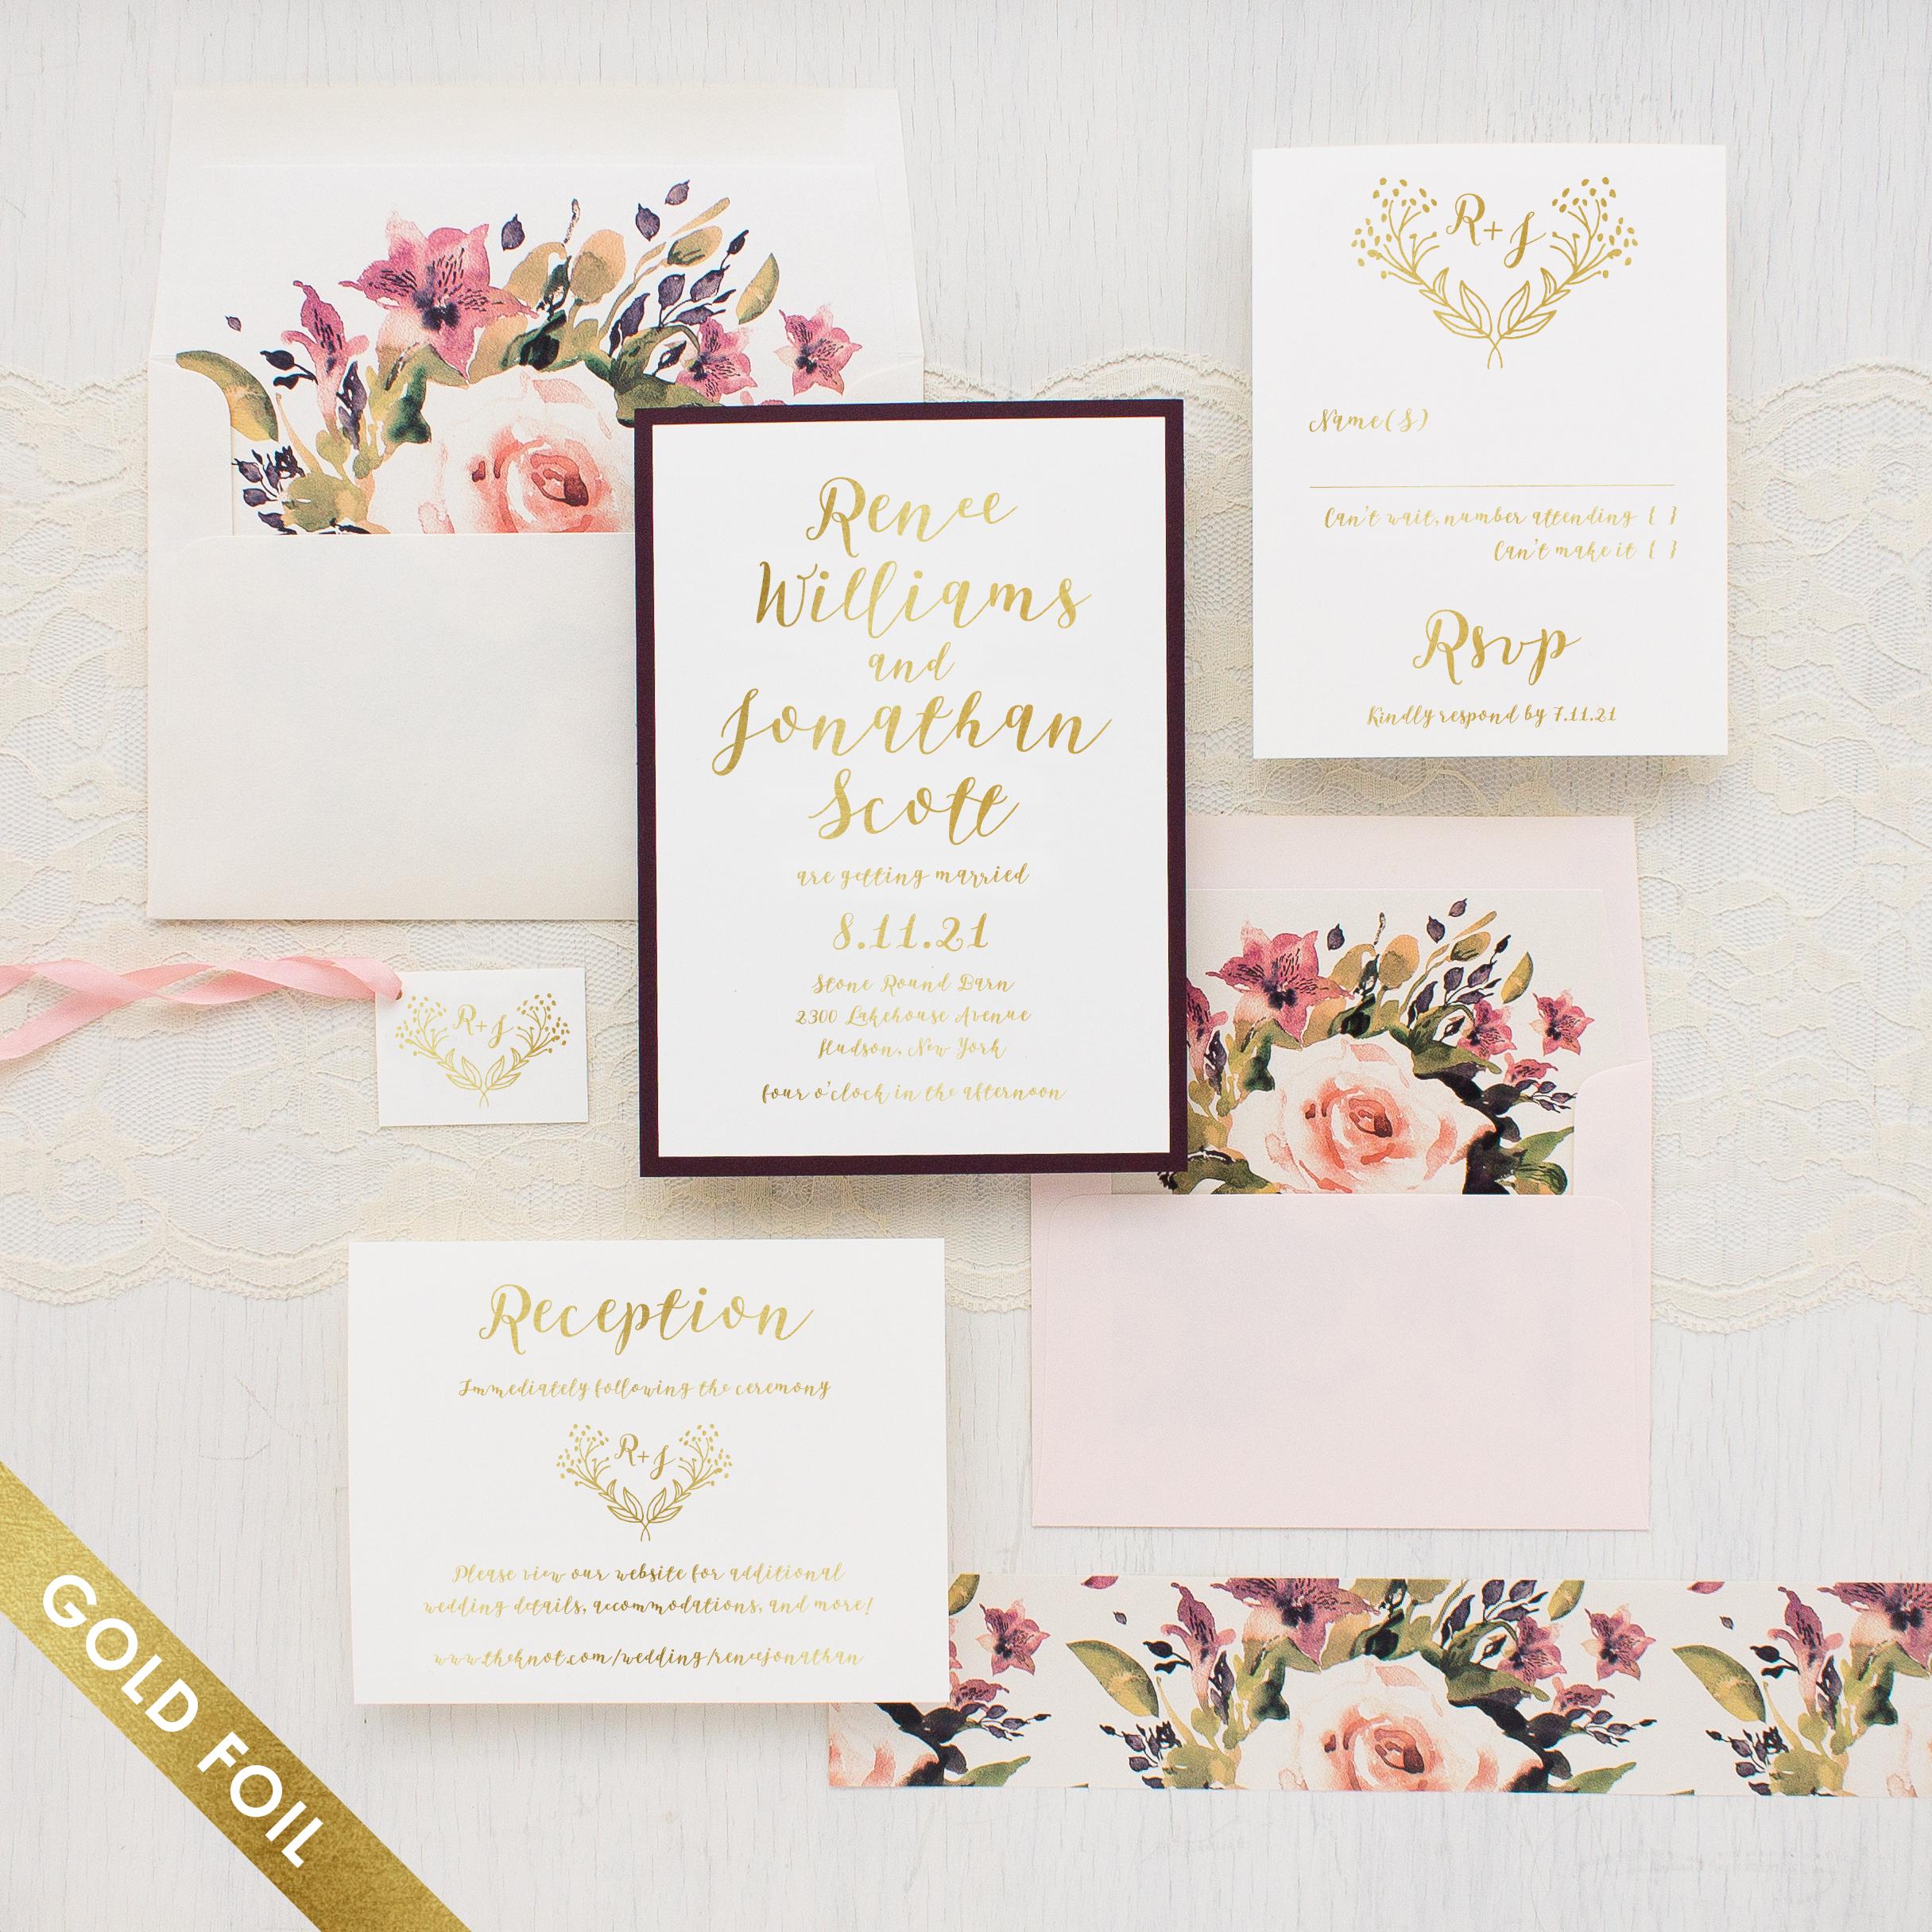 Soft Roses Gold Foil Wedding Invitations